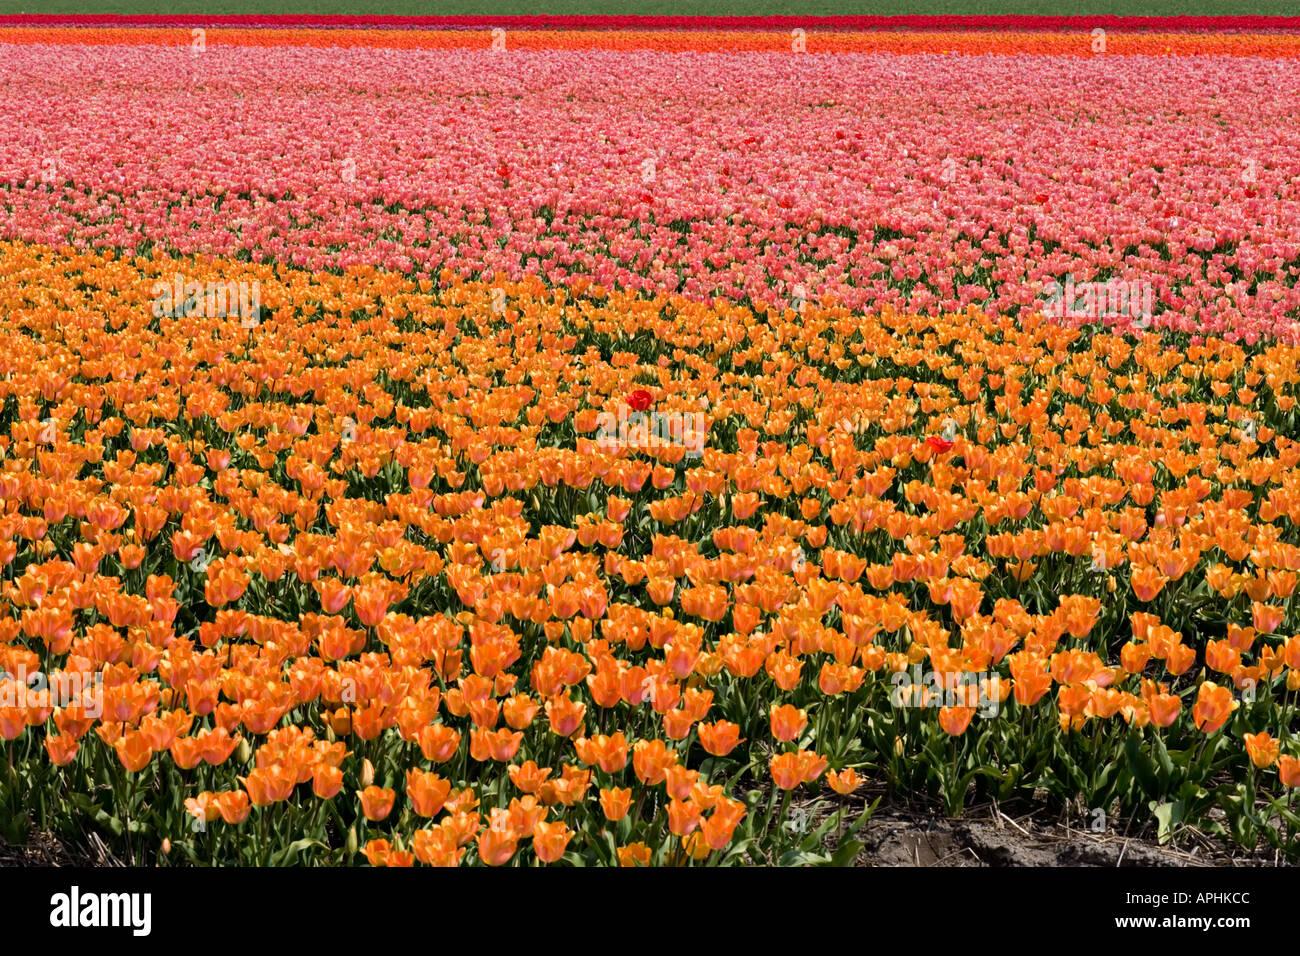 Holland. Netherlands. Endless tulip fields. - Stock Image